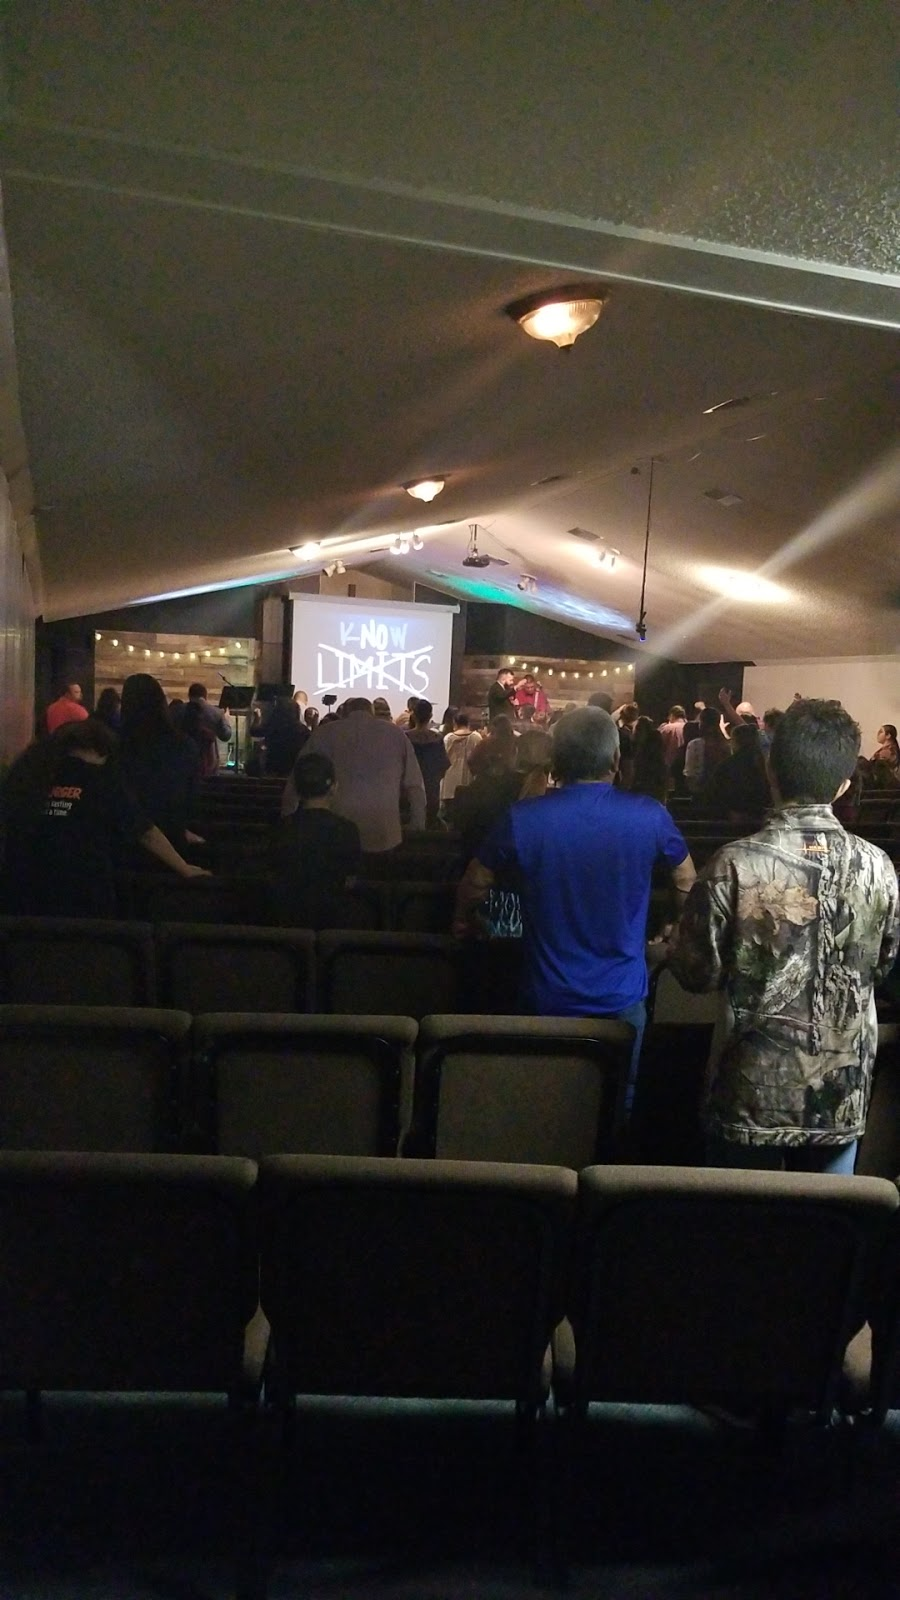 Mt. Zion Revival Center - church  | Photo 6 of 7 | Address: 2106 Jones Rd, Beeville, TX 78102, USA | Phone: (361) 343-5622